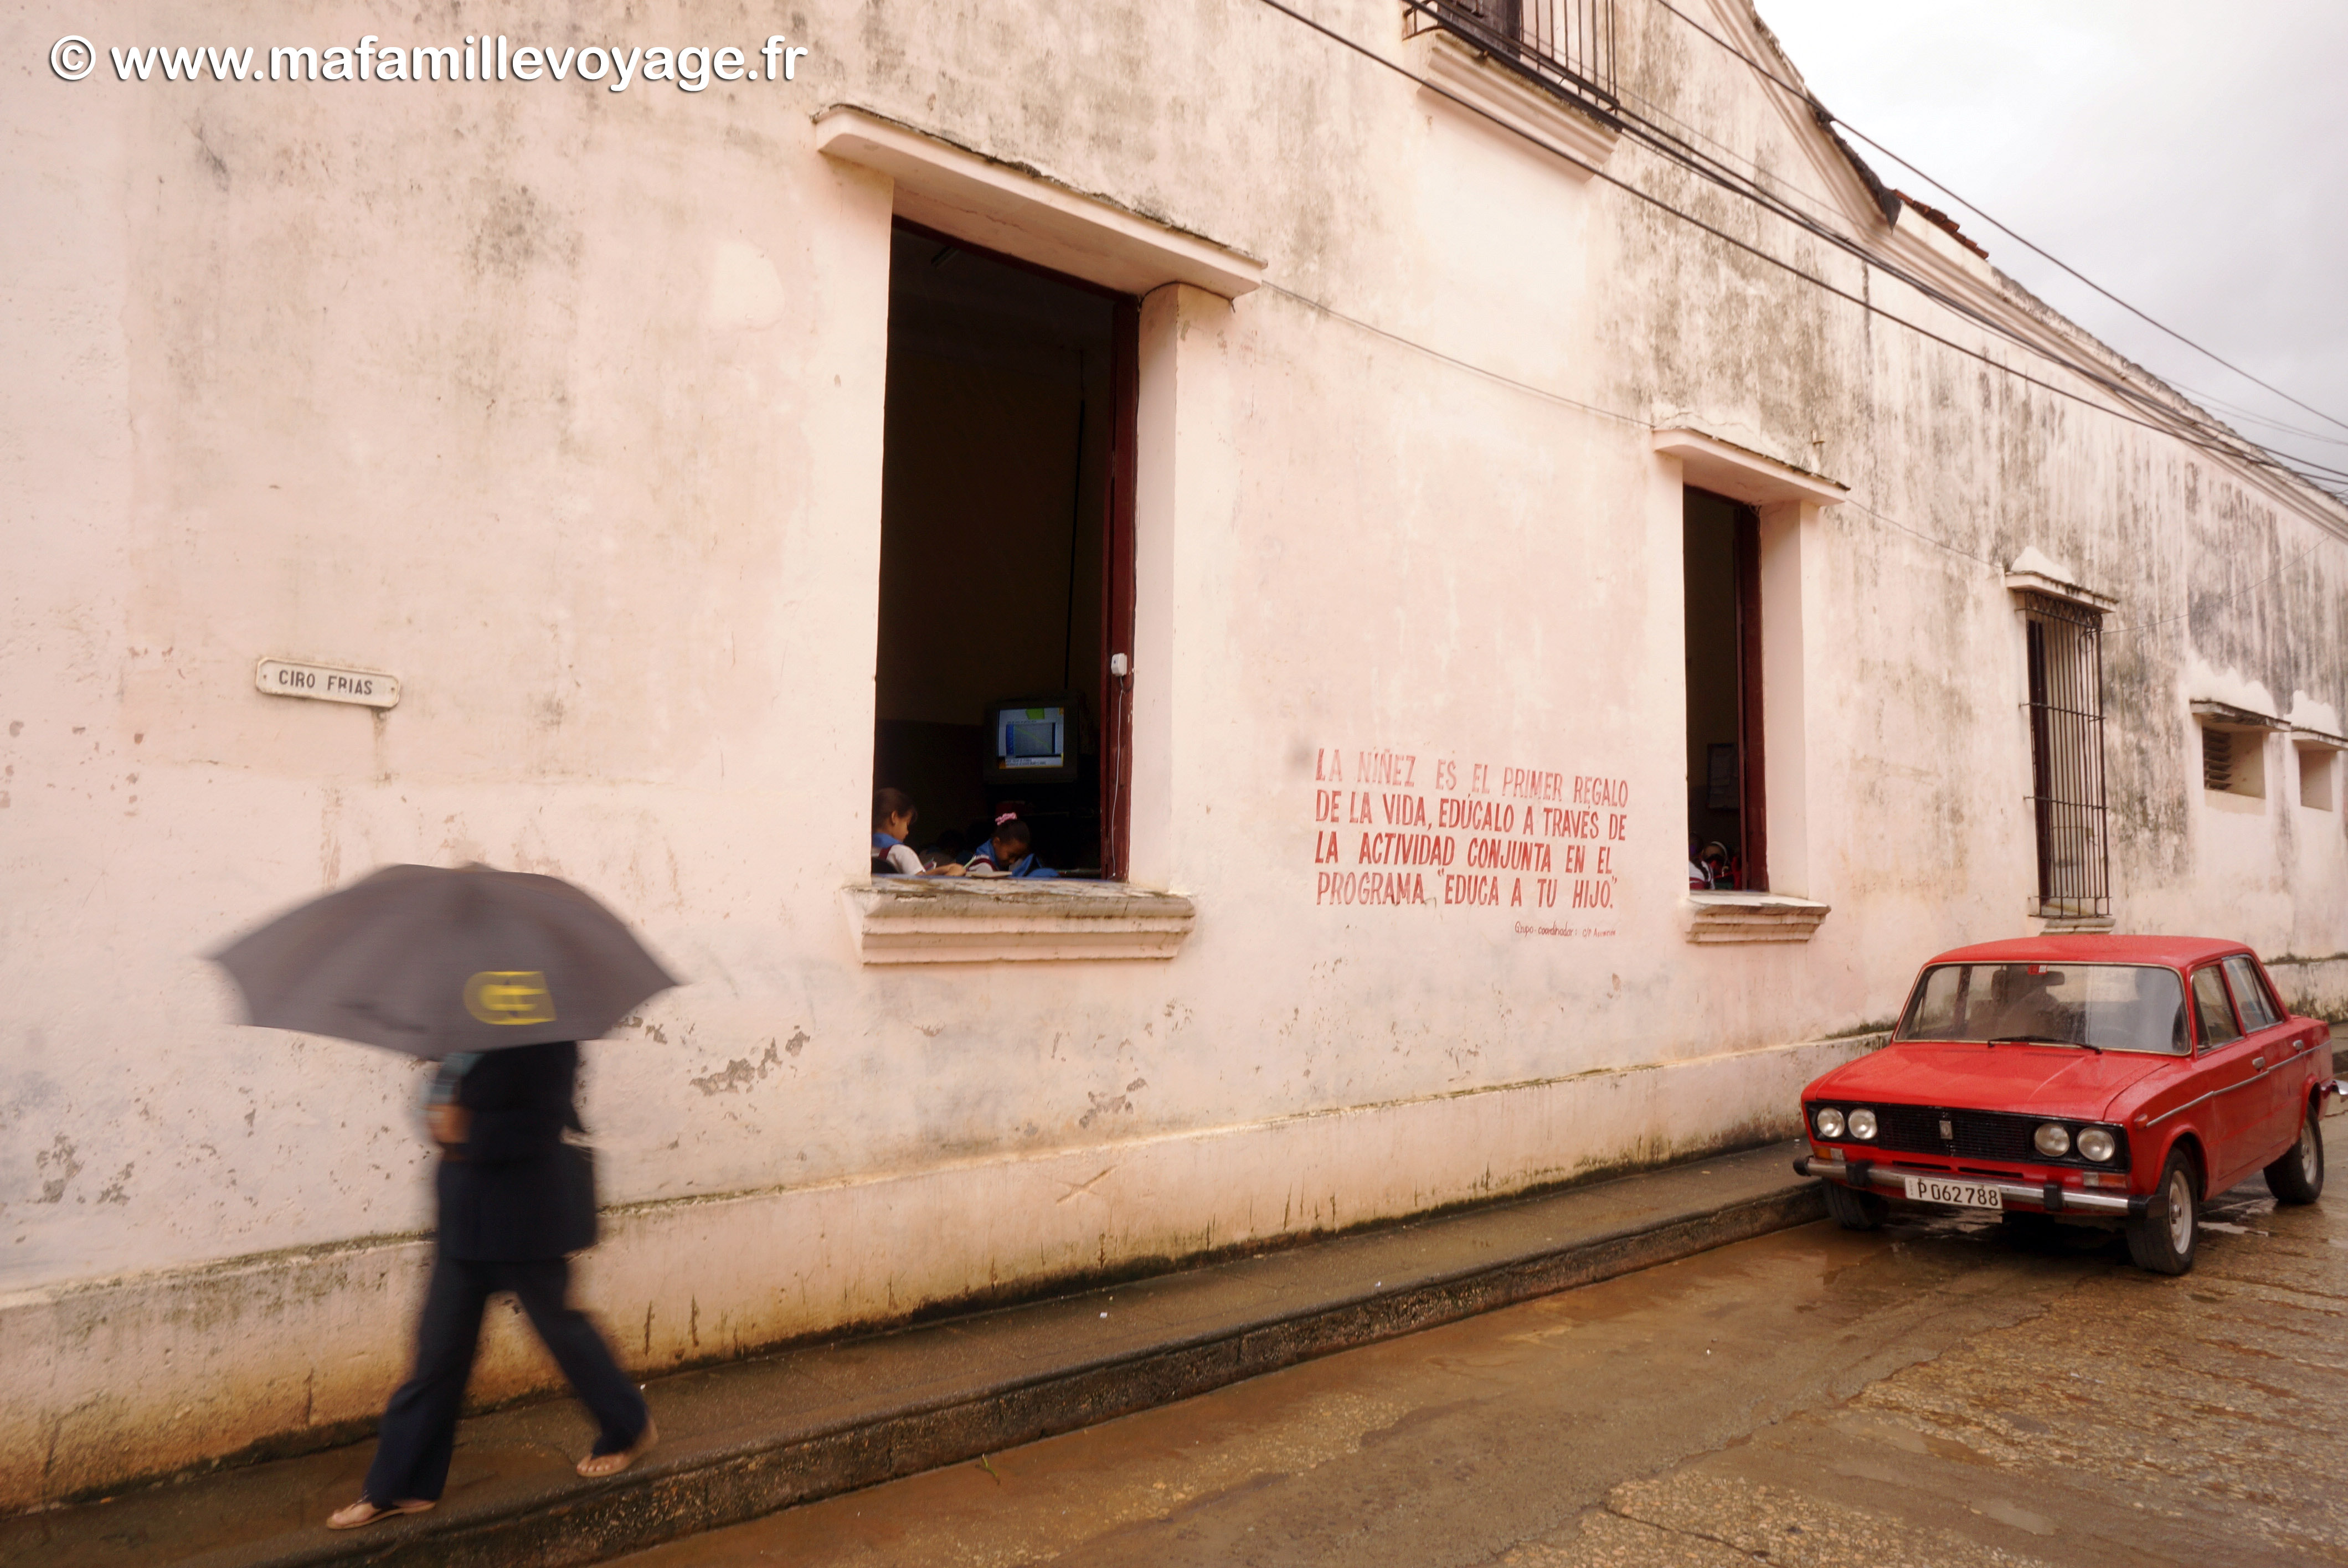 Baracoa sous la pluie